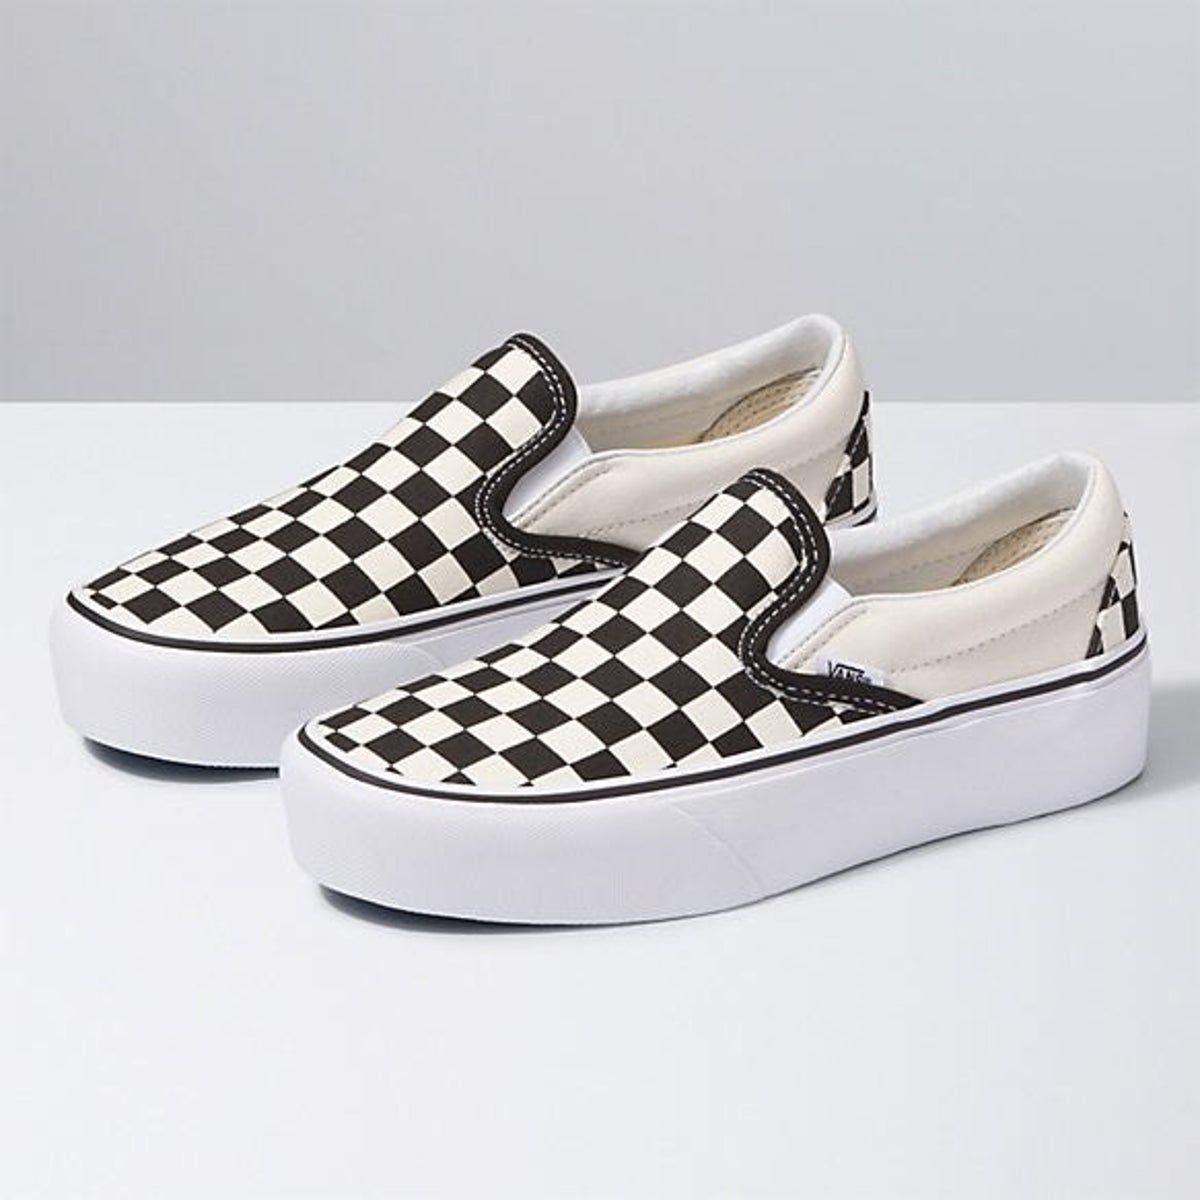 Vans Slip-On Checkered Platform Shoes